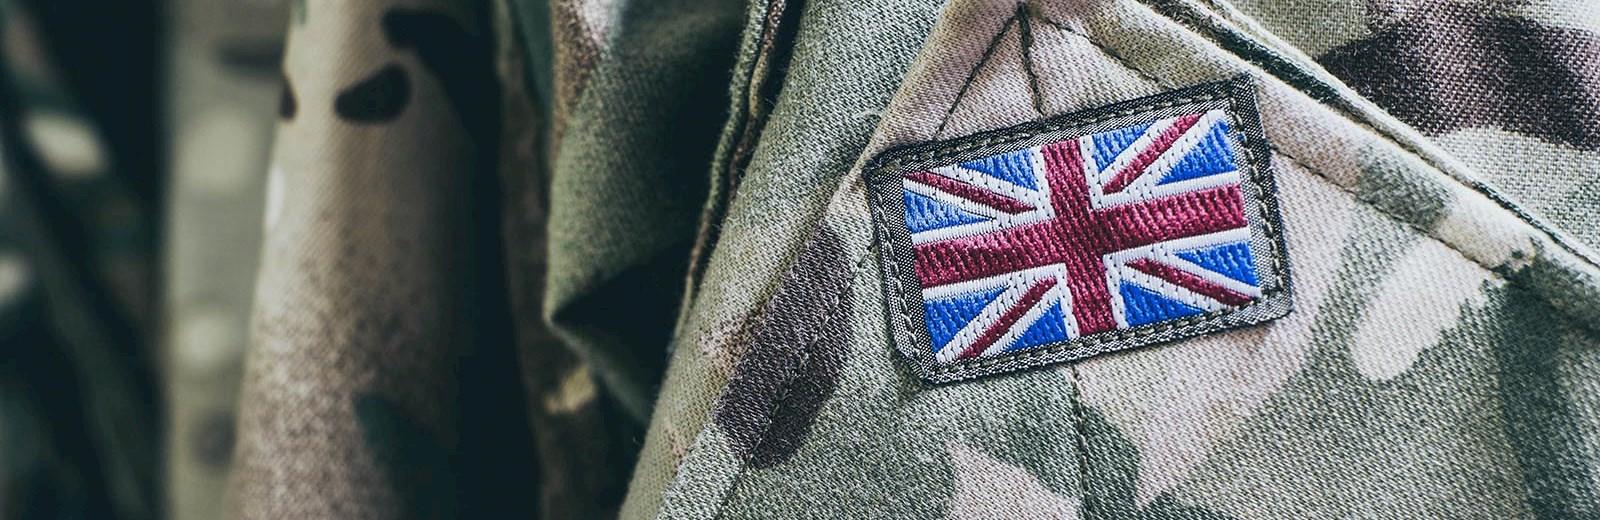 British flag on army jacket